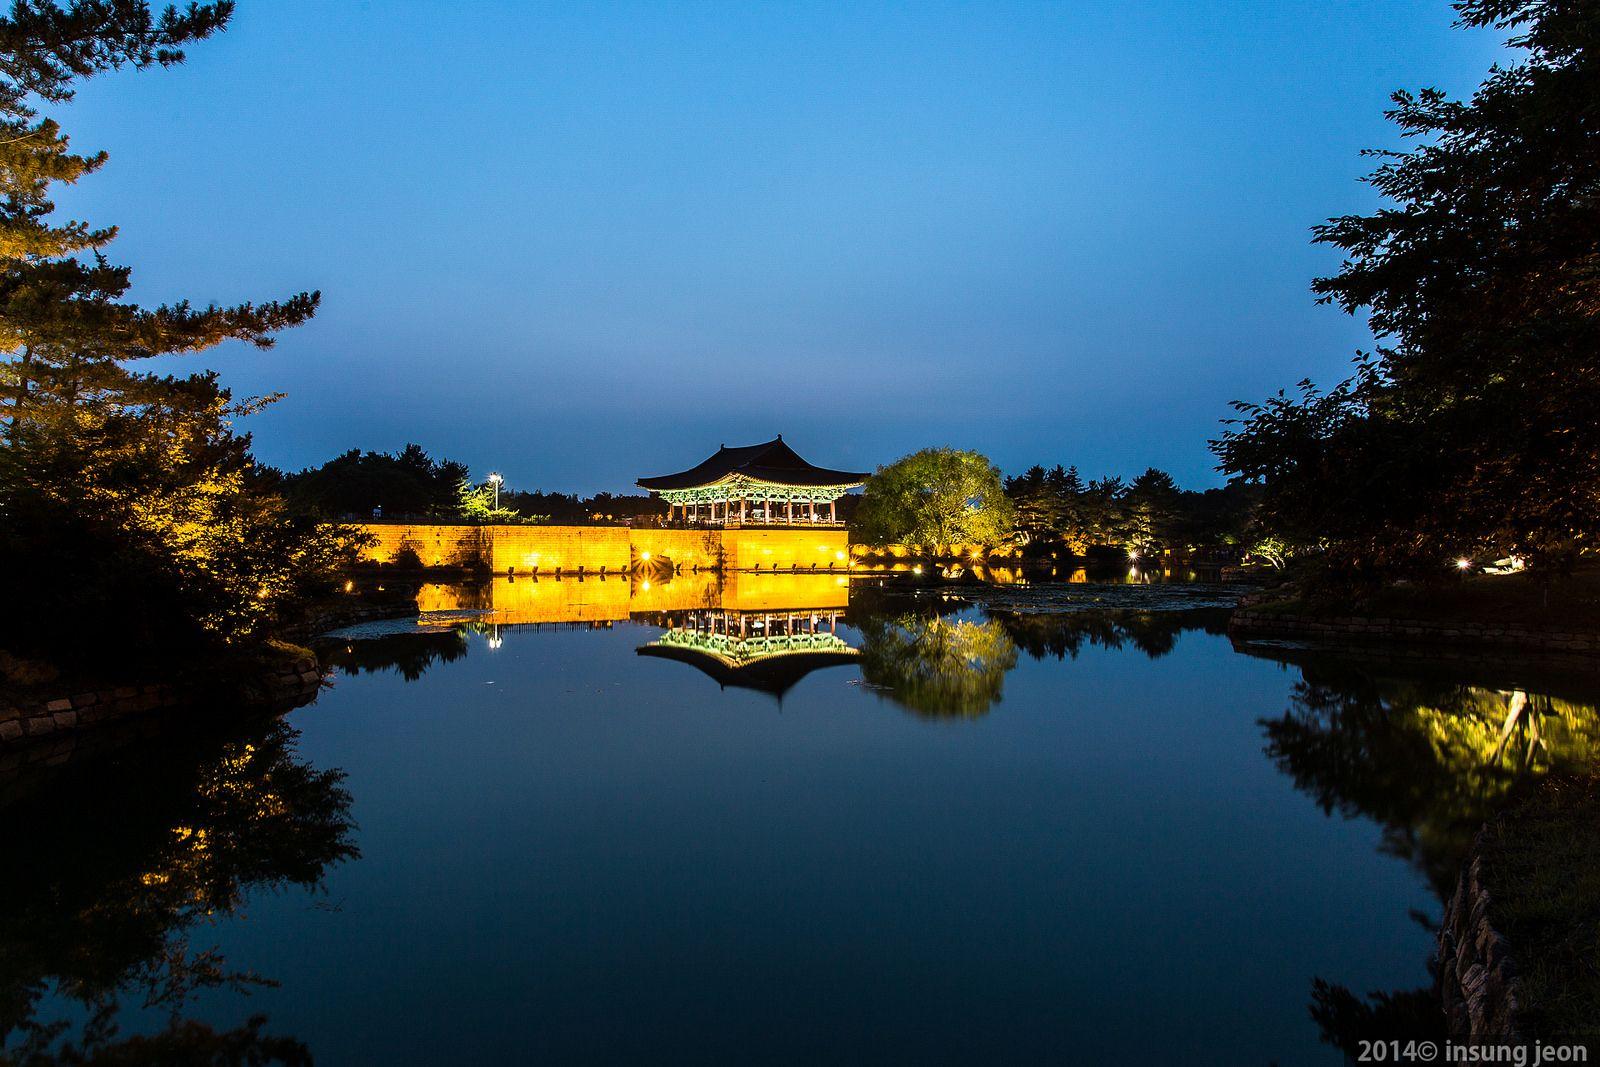 Anapji Pond (안압지) at night